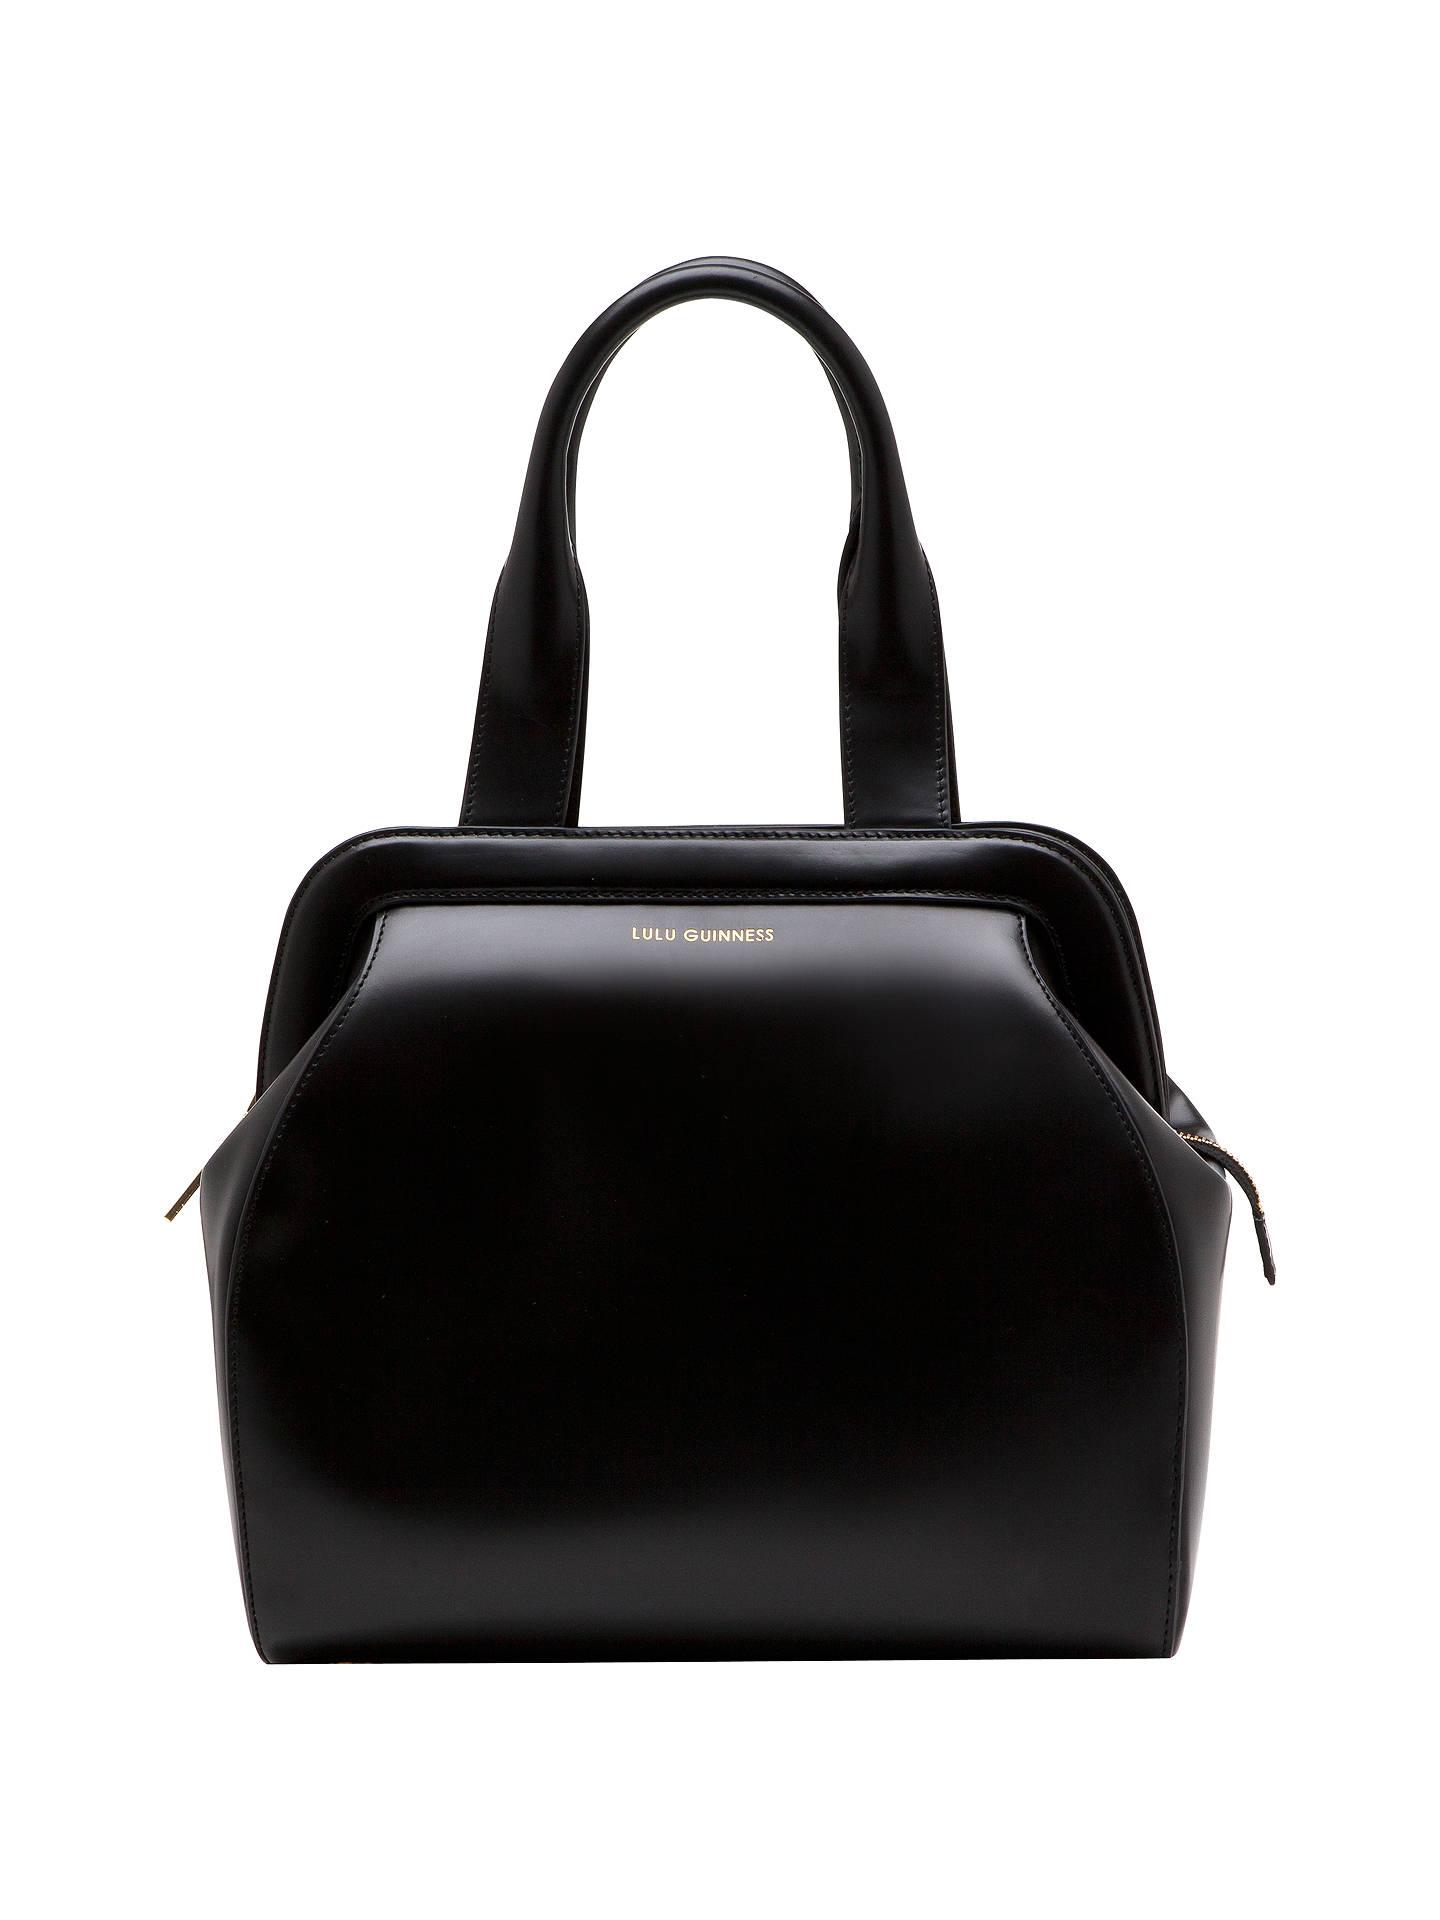 d4ce8f3d3f Buy Lulu Guinness Large Paula Polished Leather Shoulder Handbag